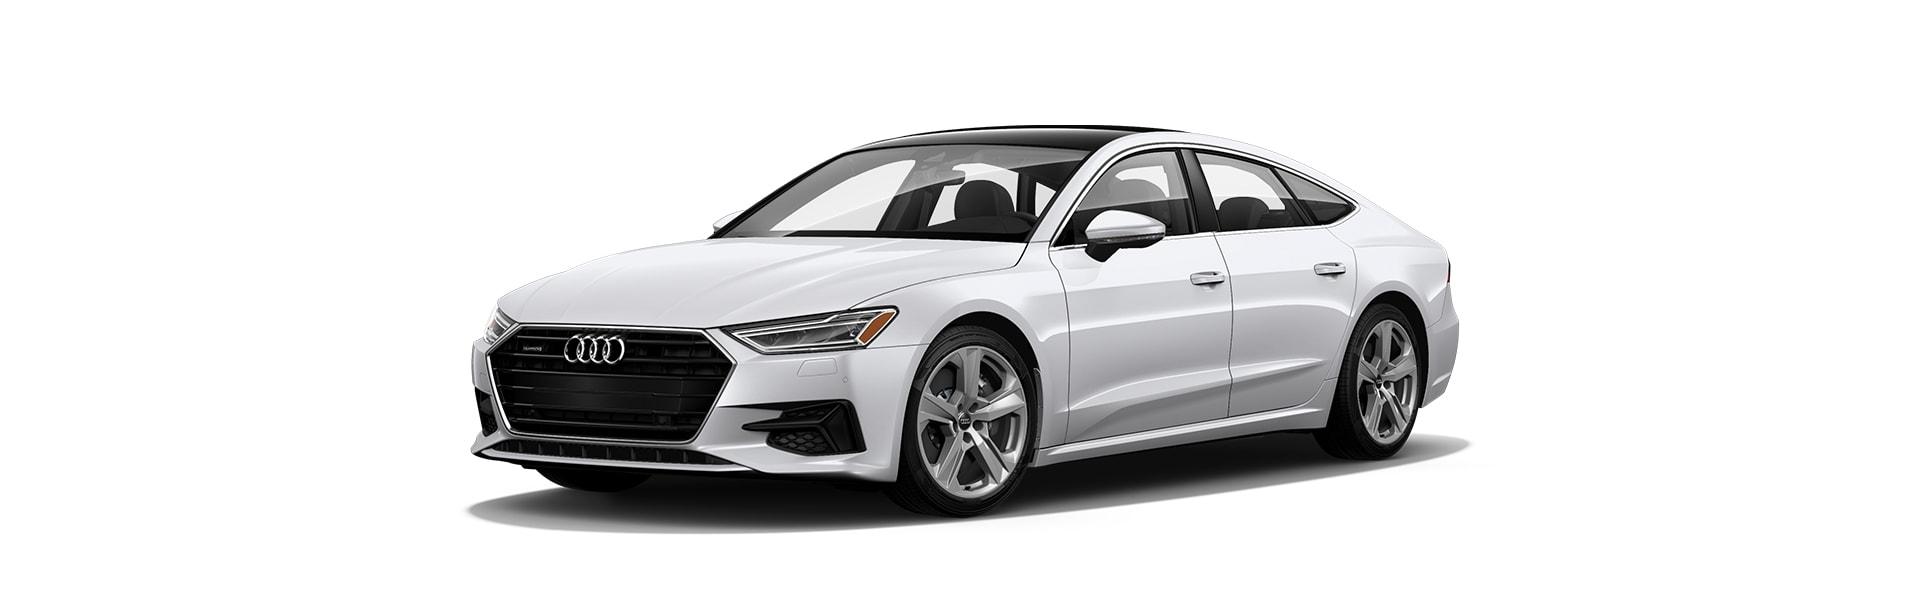 2019 A7 Sportback models